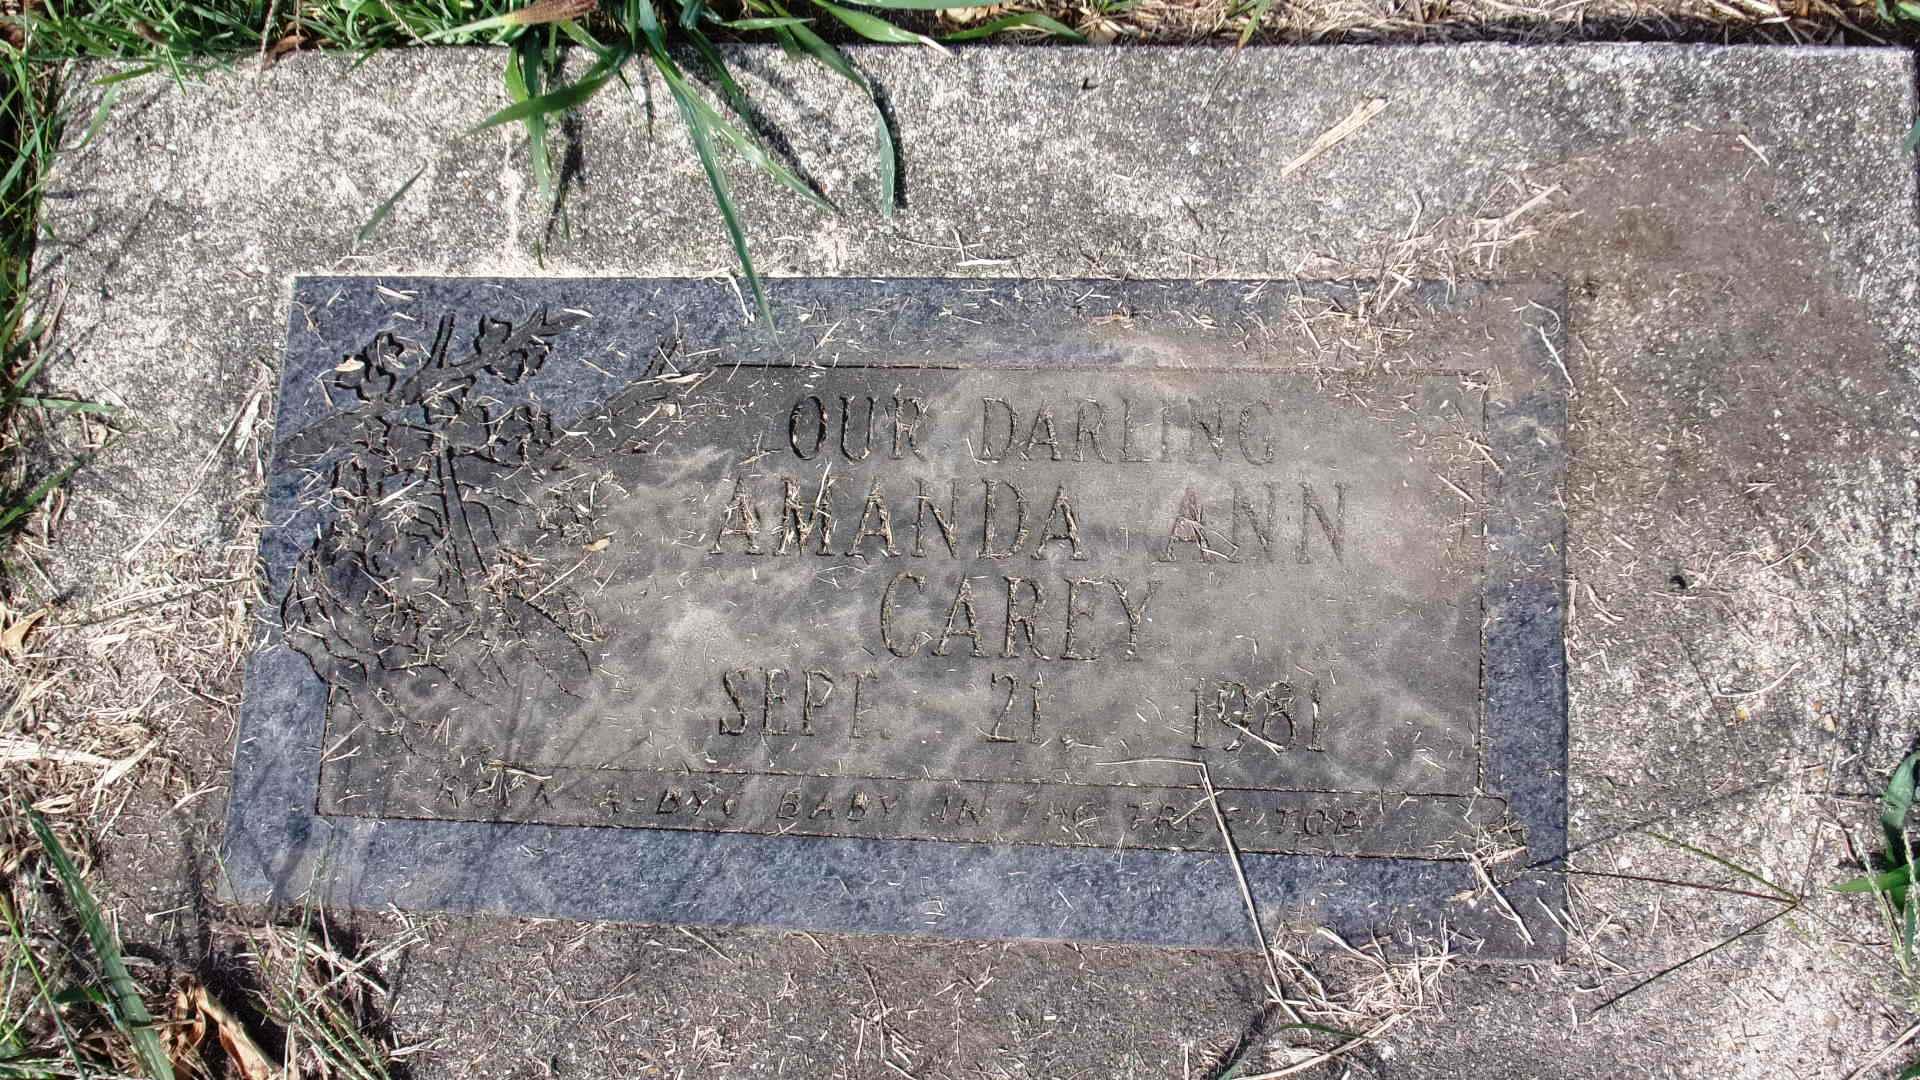 Amanda Ann Carey